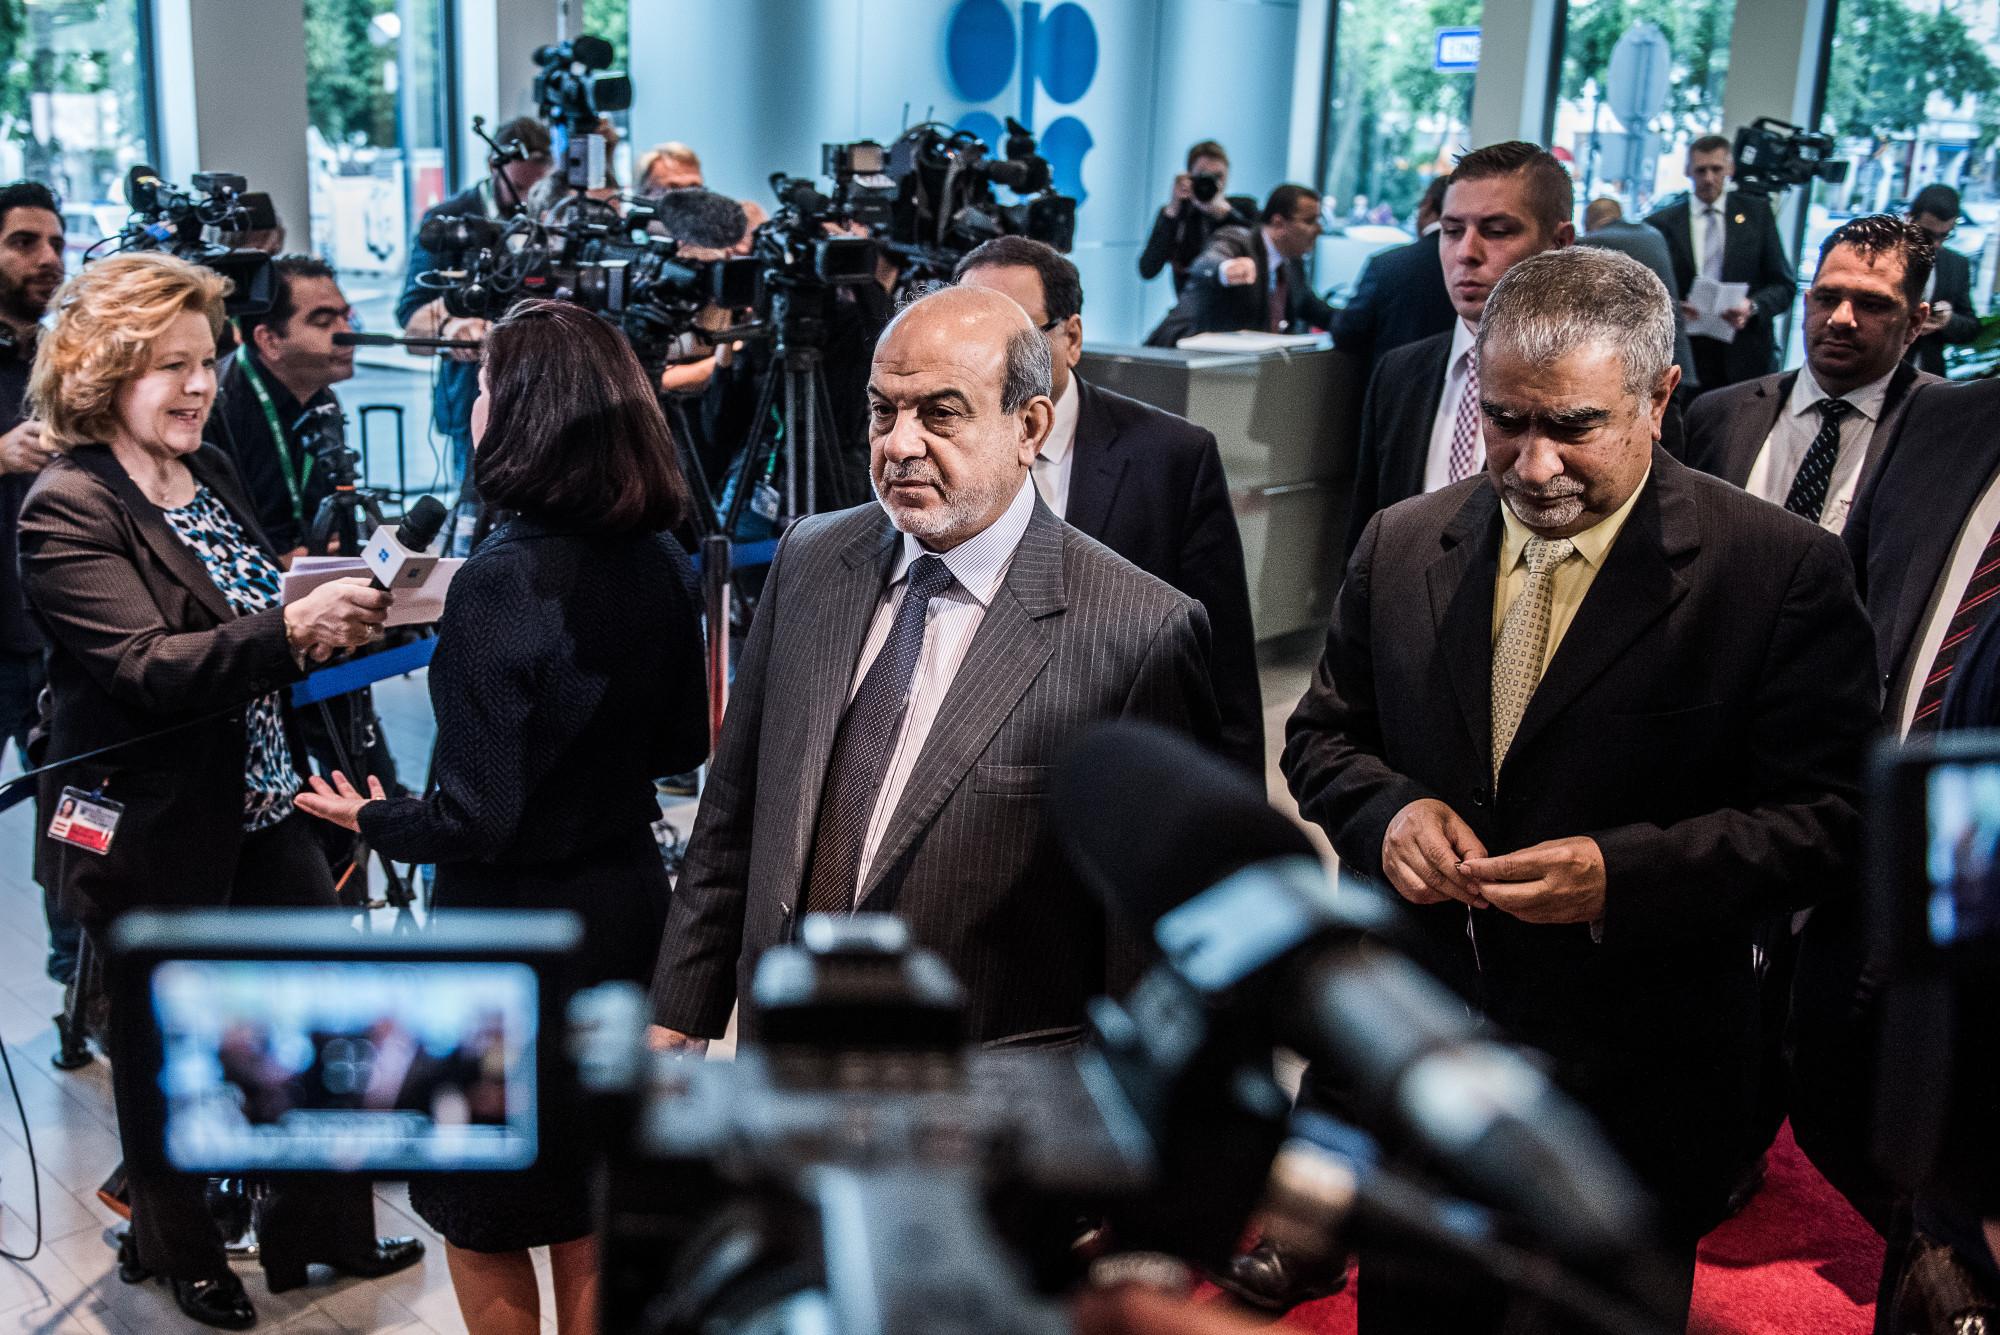 Fayyad Al-Nima Photographer: Akos Stiller/Bloomberg